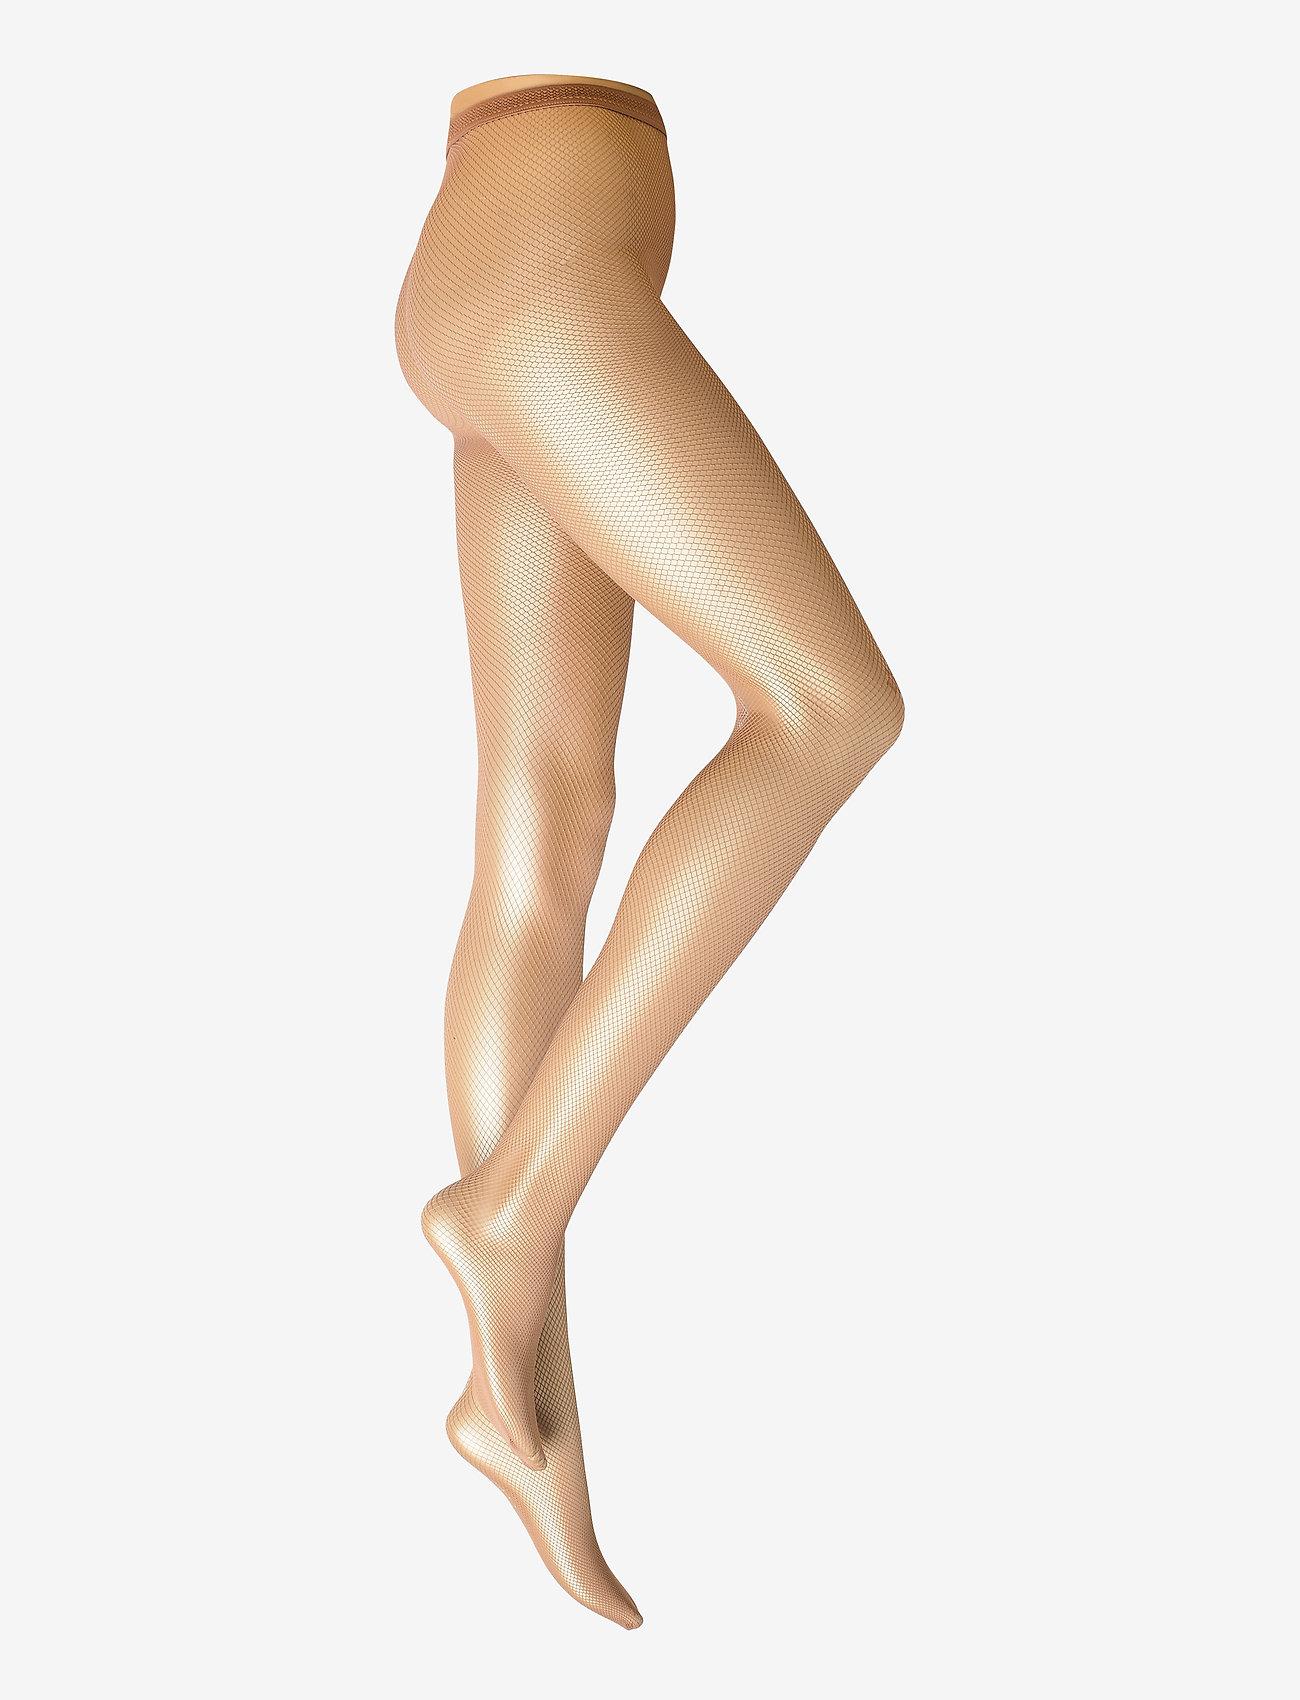 Swedish Stockings - Liv net tights micro net - panty's - nude - 0